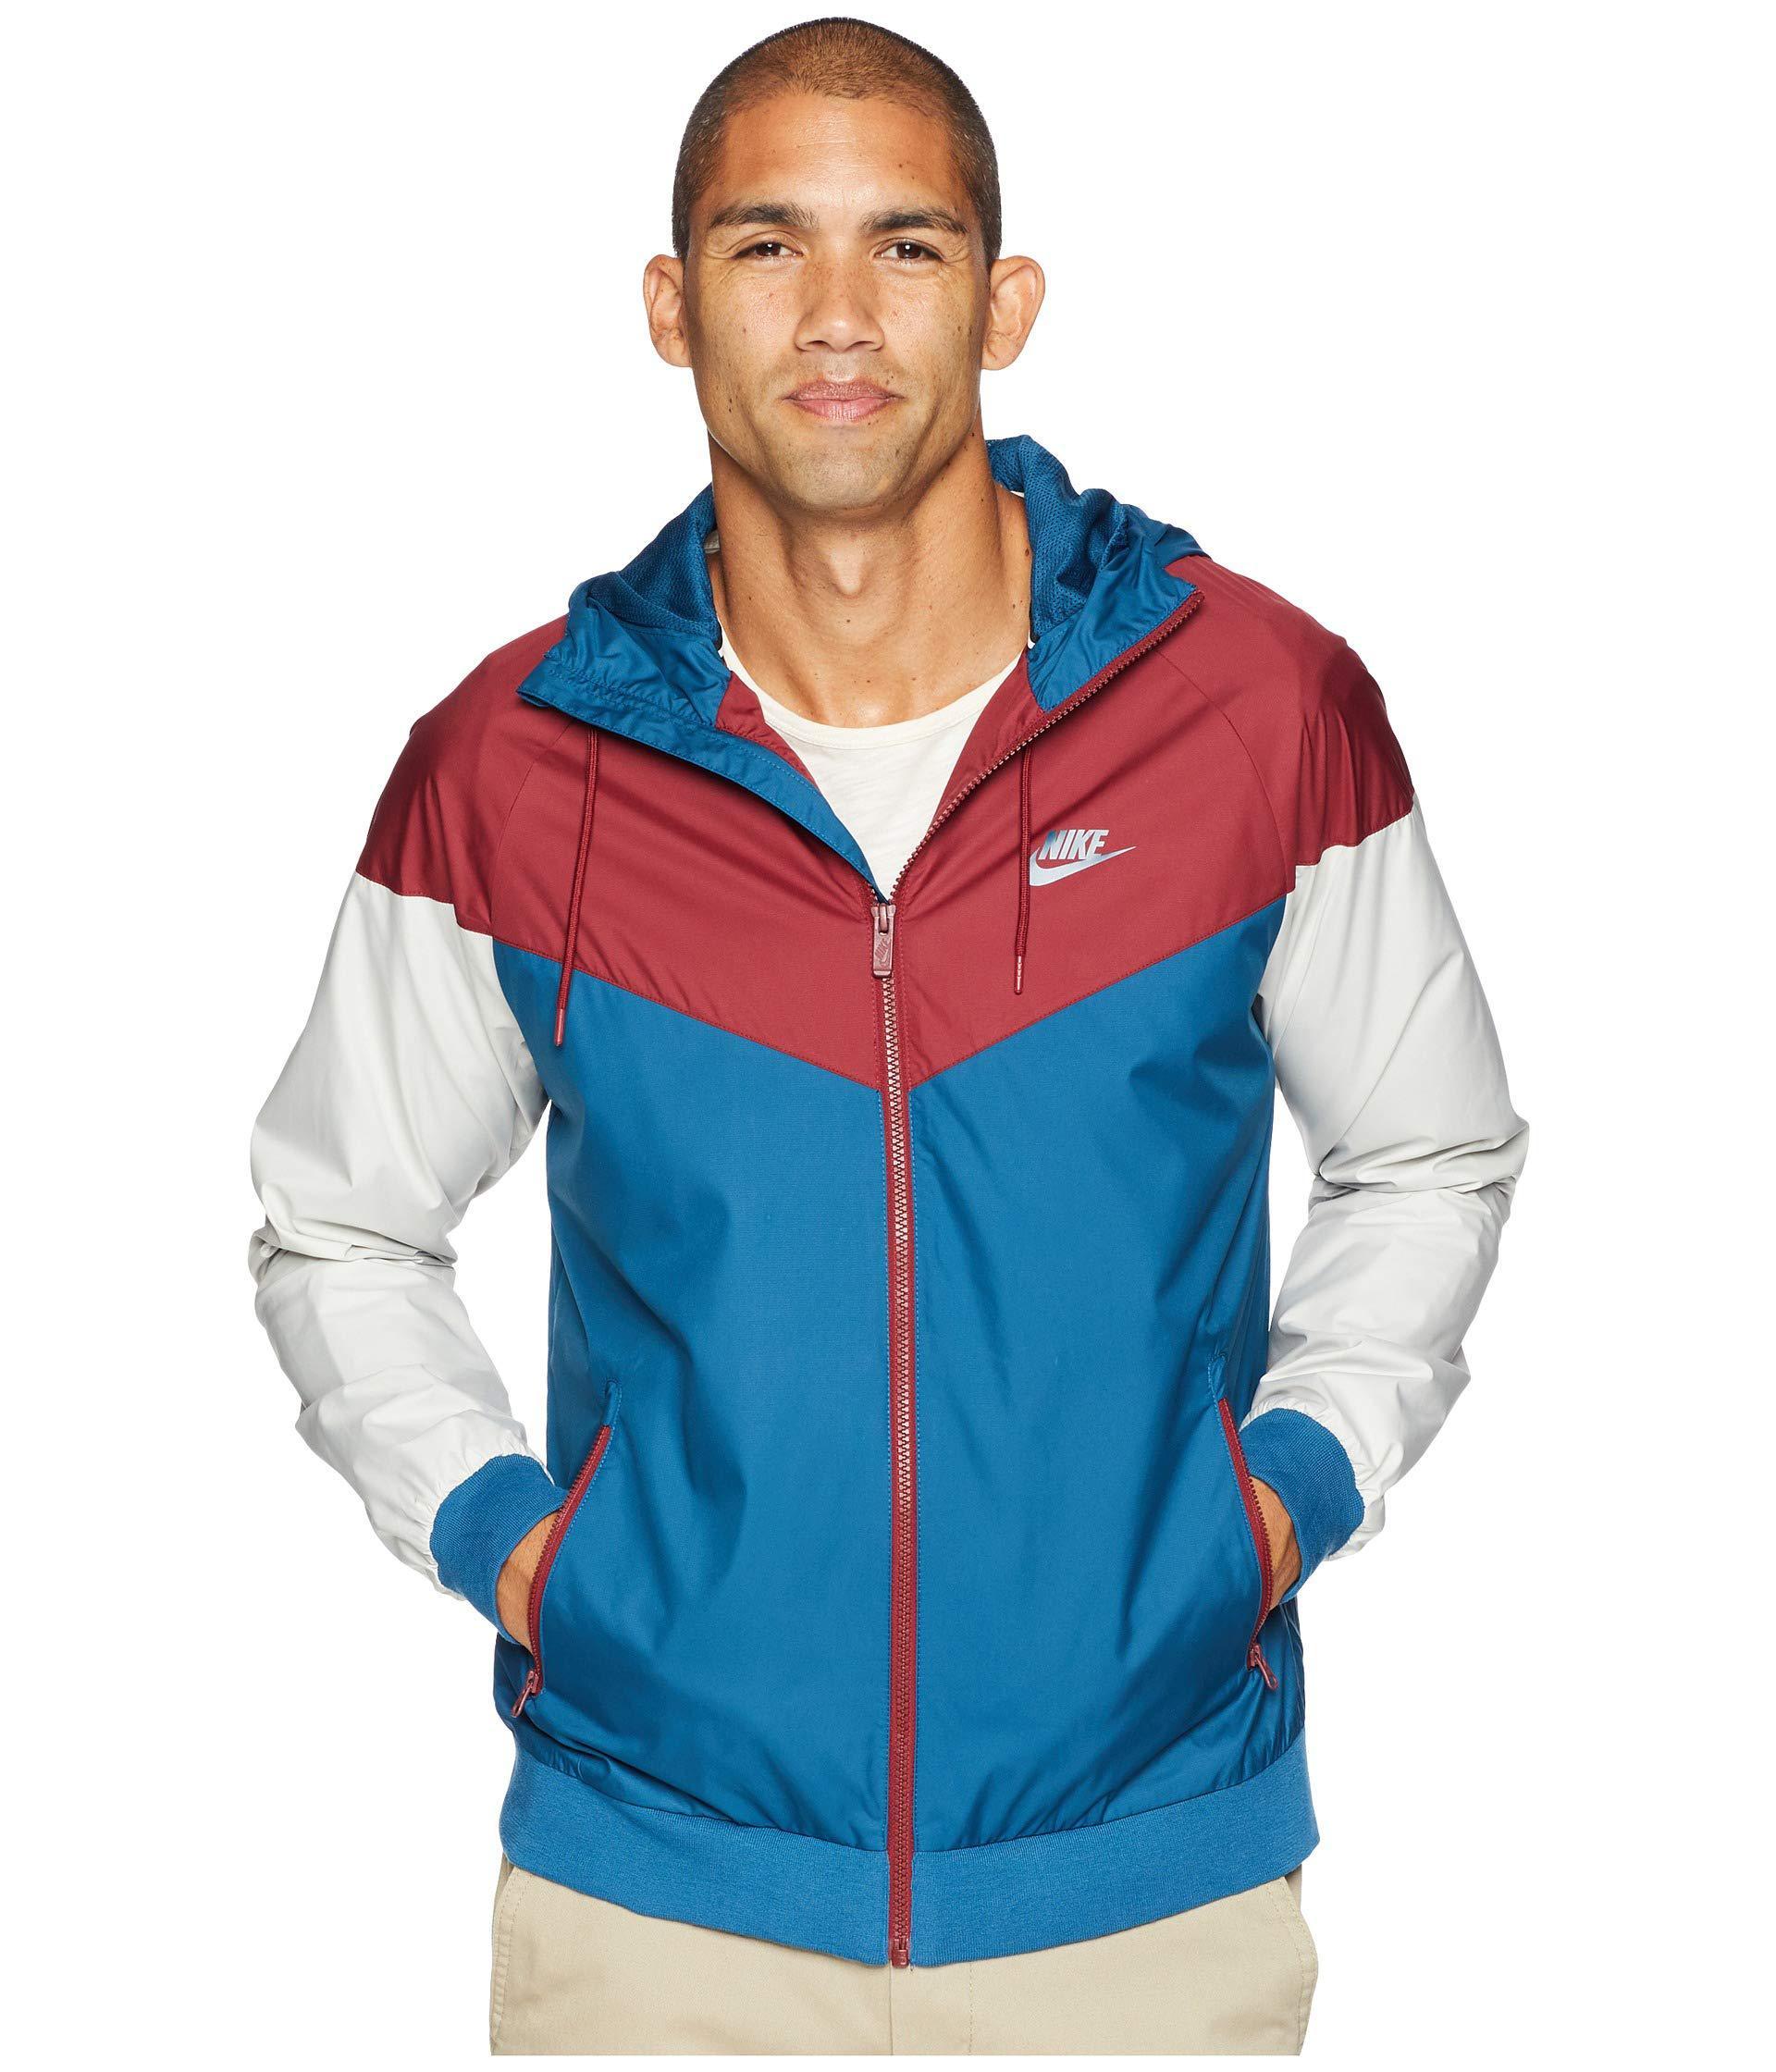 cacbc7c7de Lyst - Nike Sportwear Windrunner Jacket in Blue for Men - Save 8%